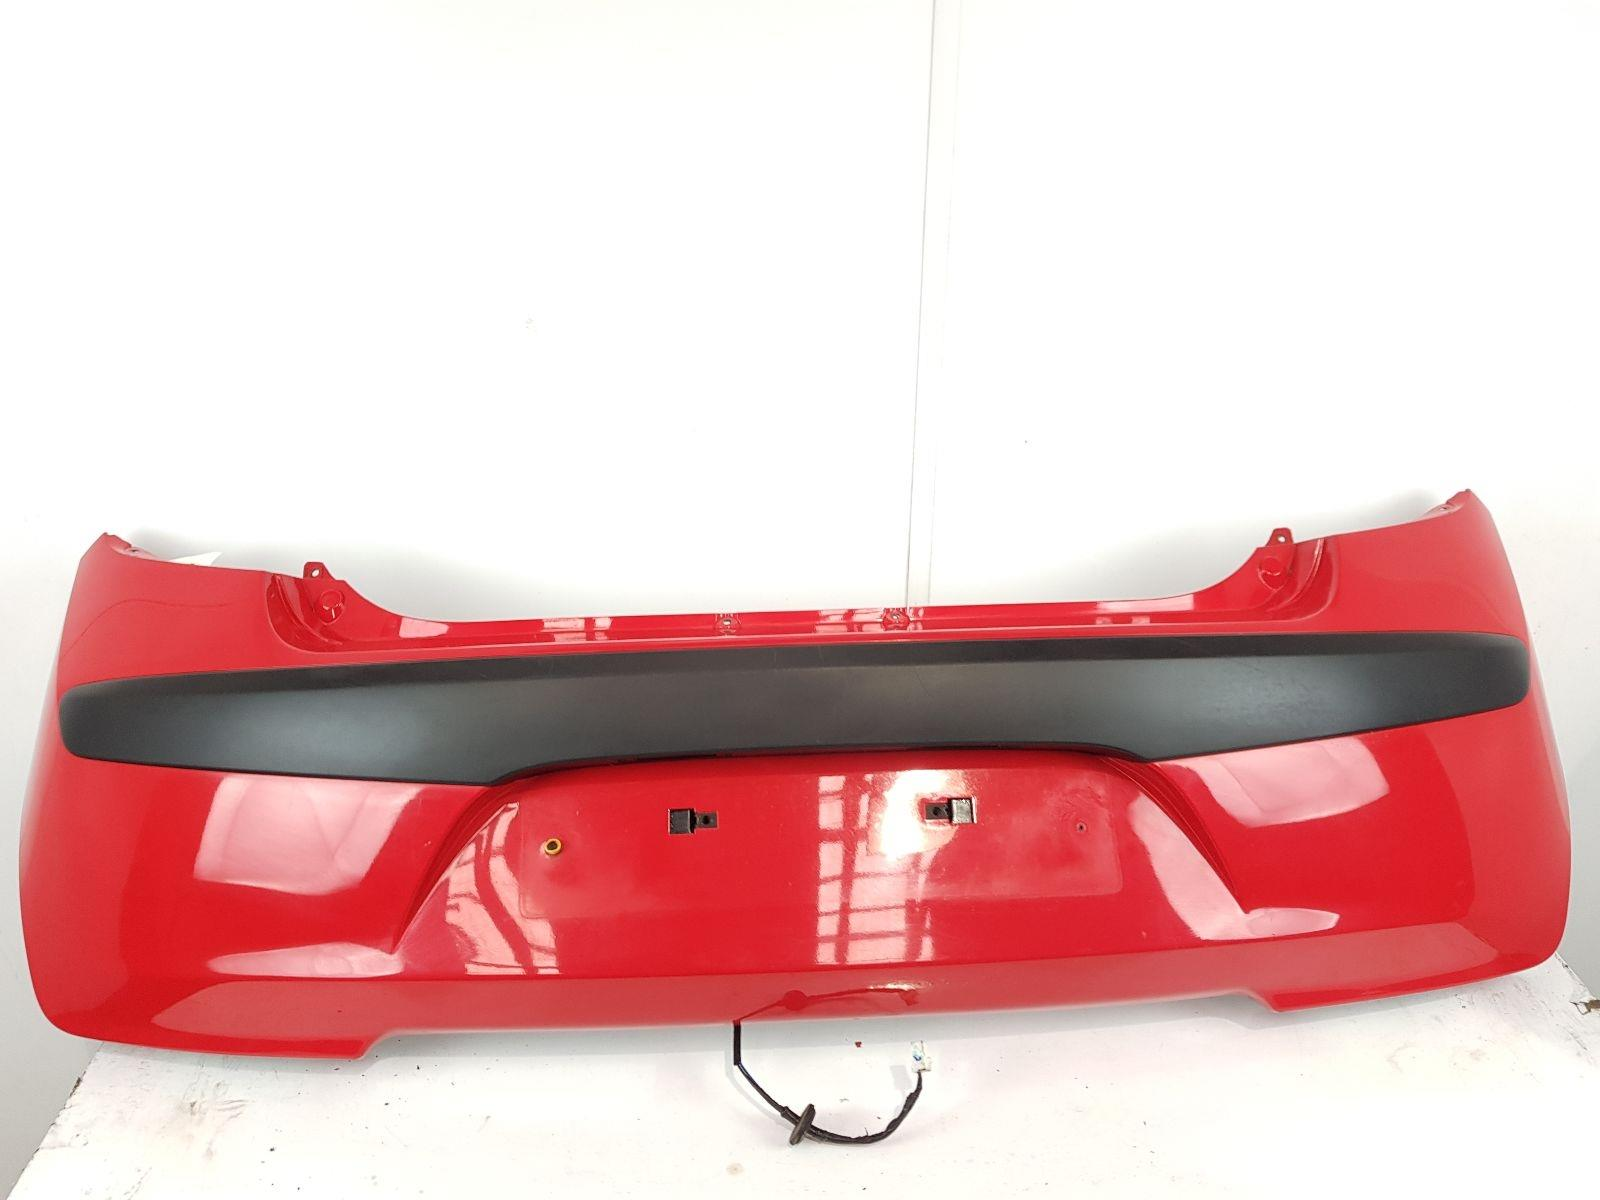 2008-2010 MK1 Hyundai i10 REAR BUMPER Red 5 Door Hatchback 866120X000